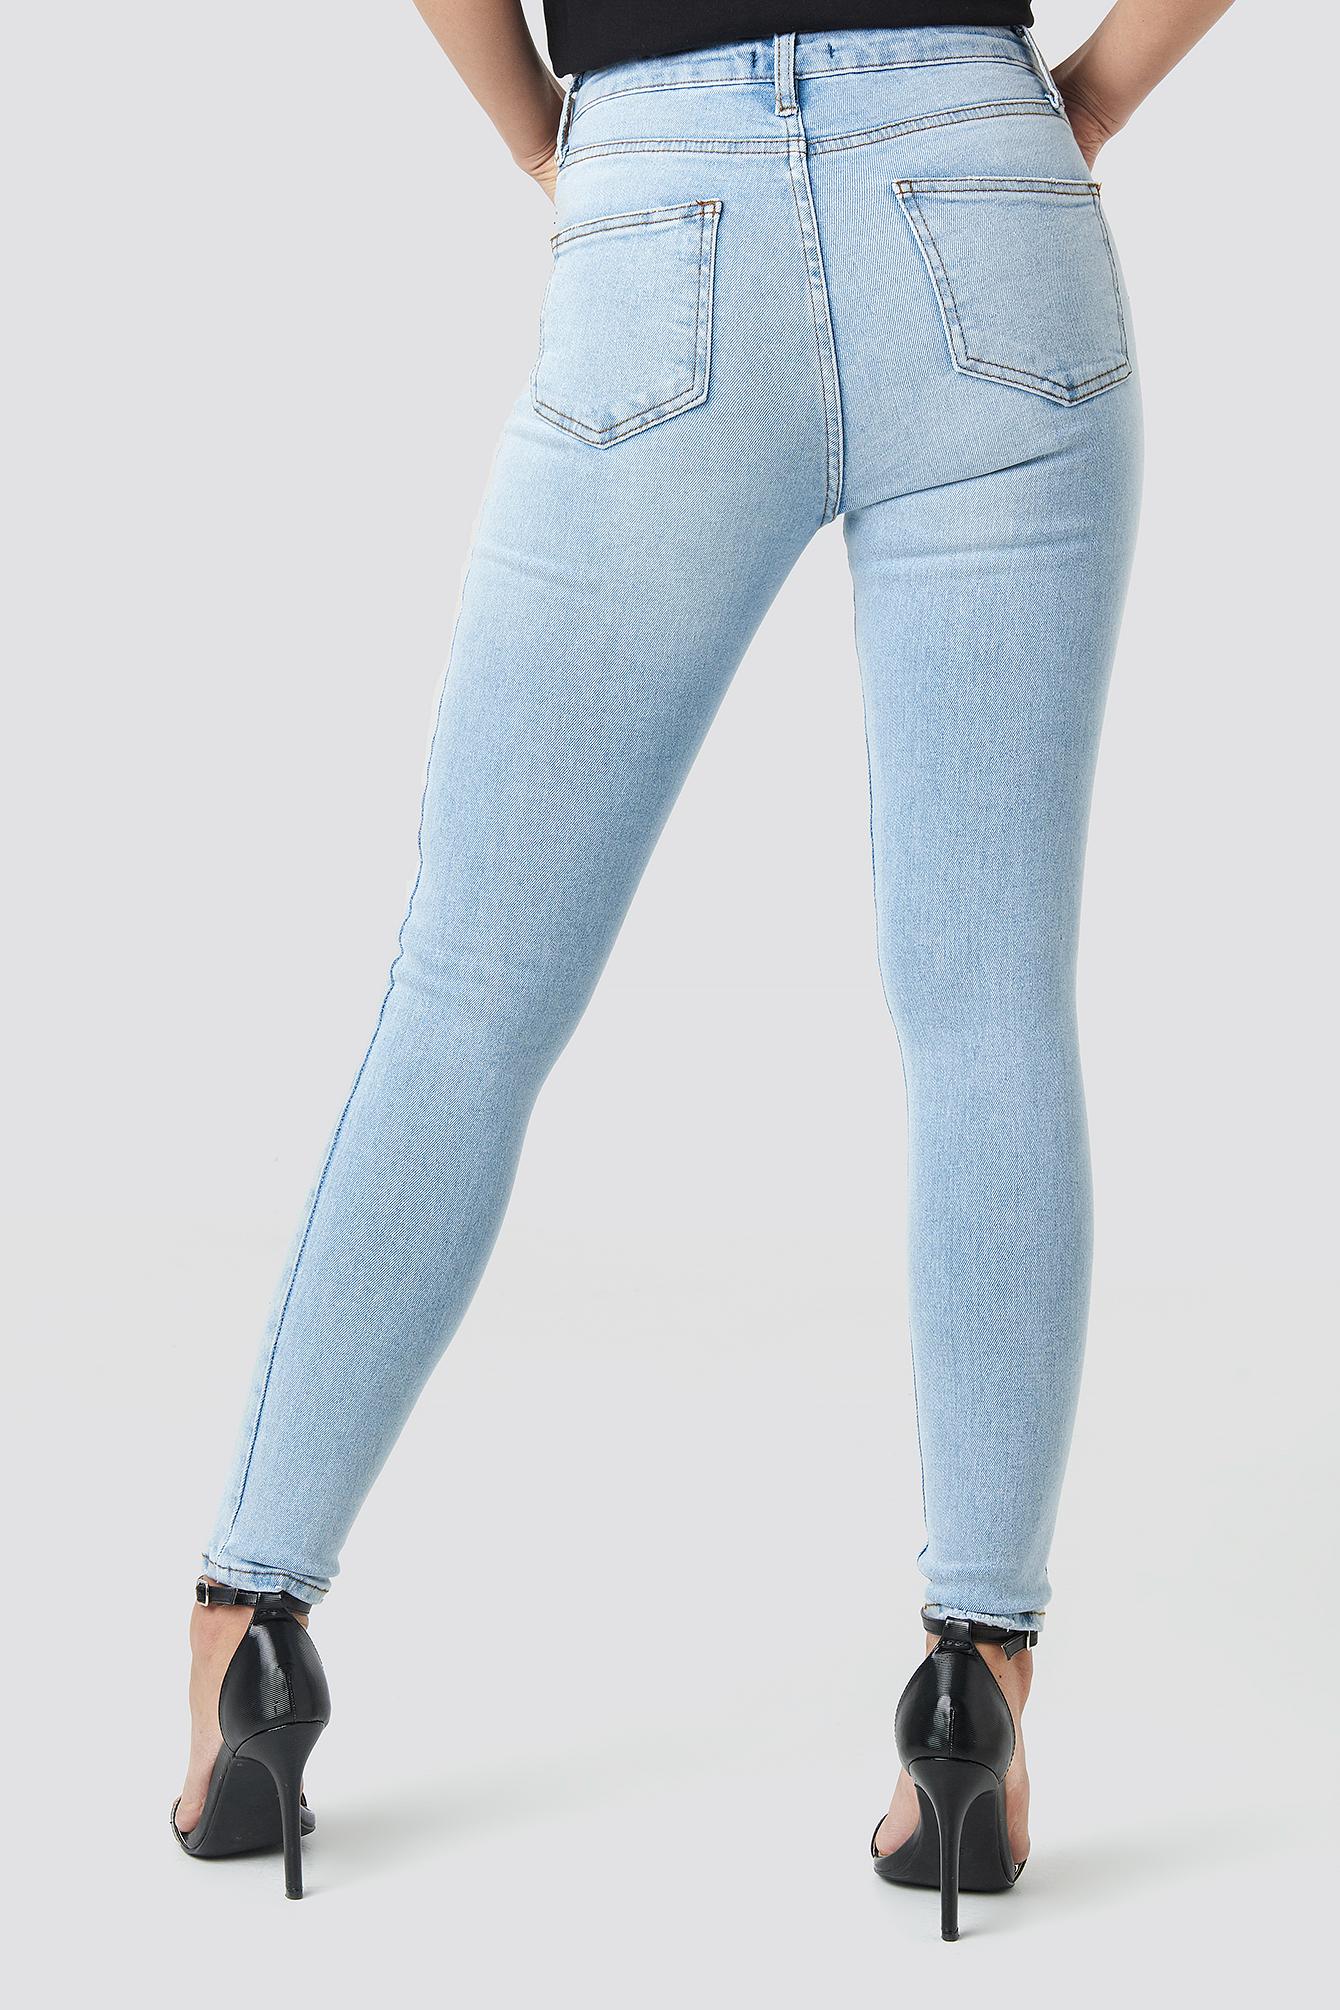 Yol High Waist Skinny Jeans NA-KD.COM